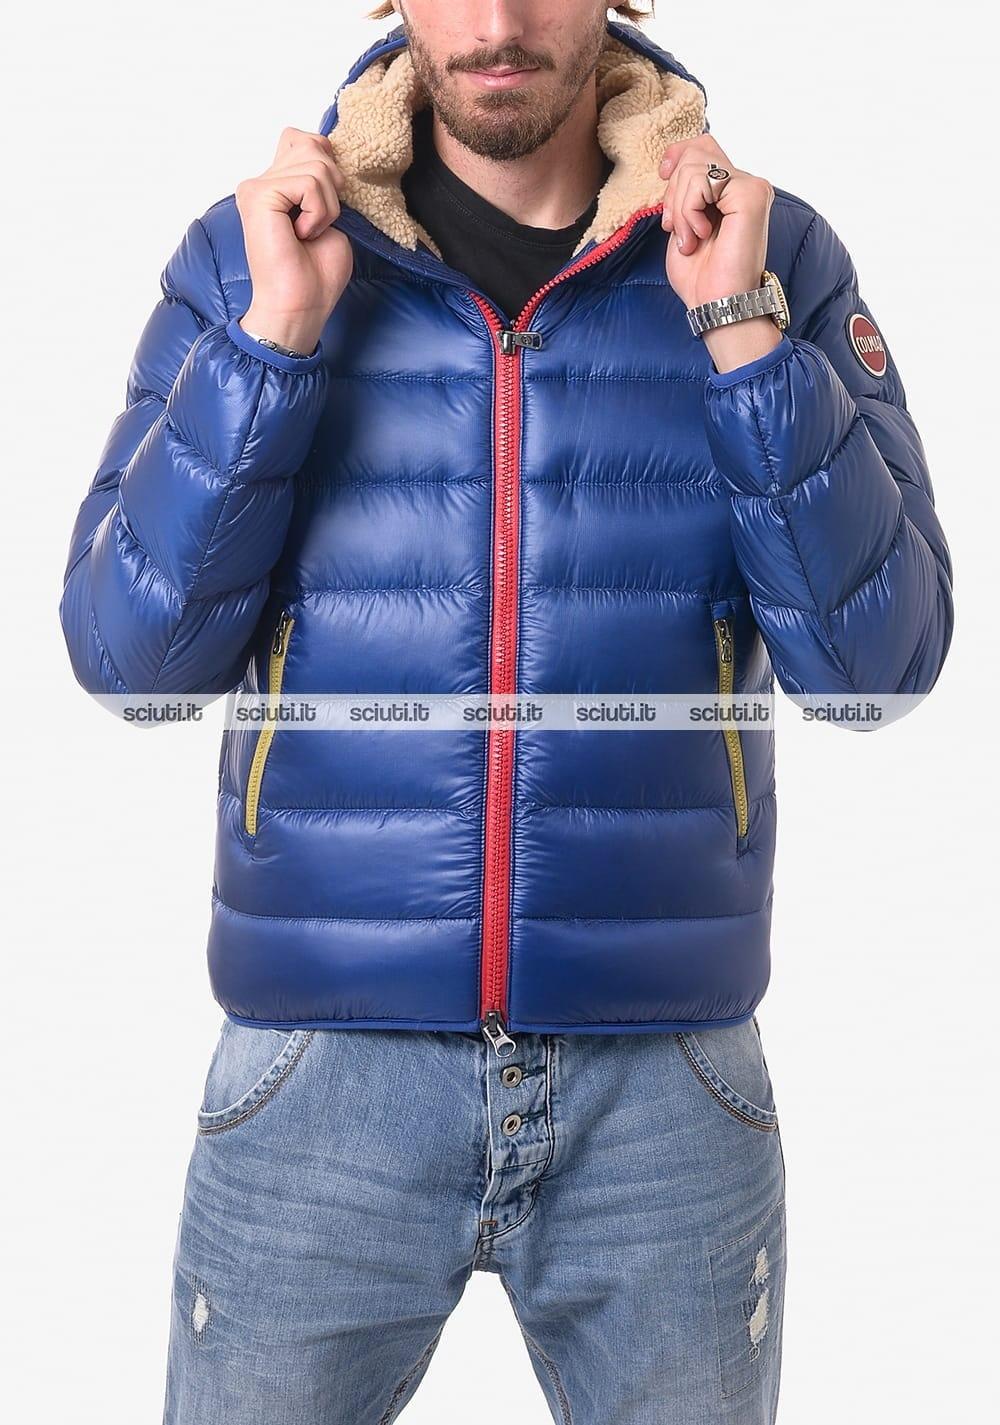 online retailer 42c82 34905 Giubbotto Colmar uomo pesante lucido imbottito blu royal ...